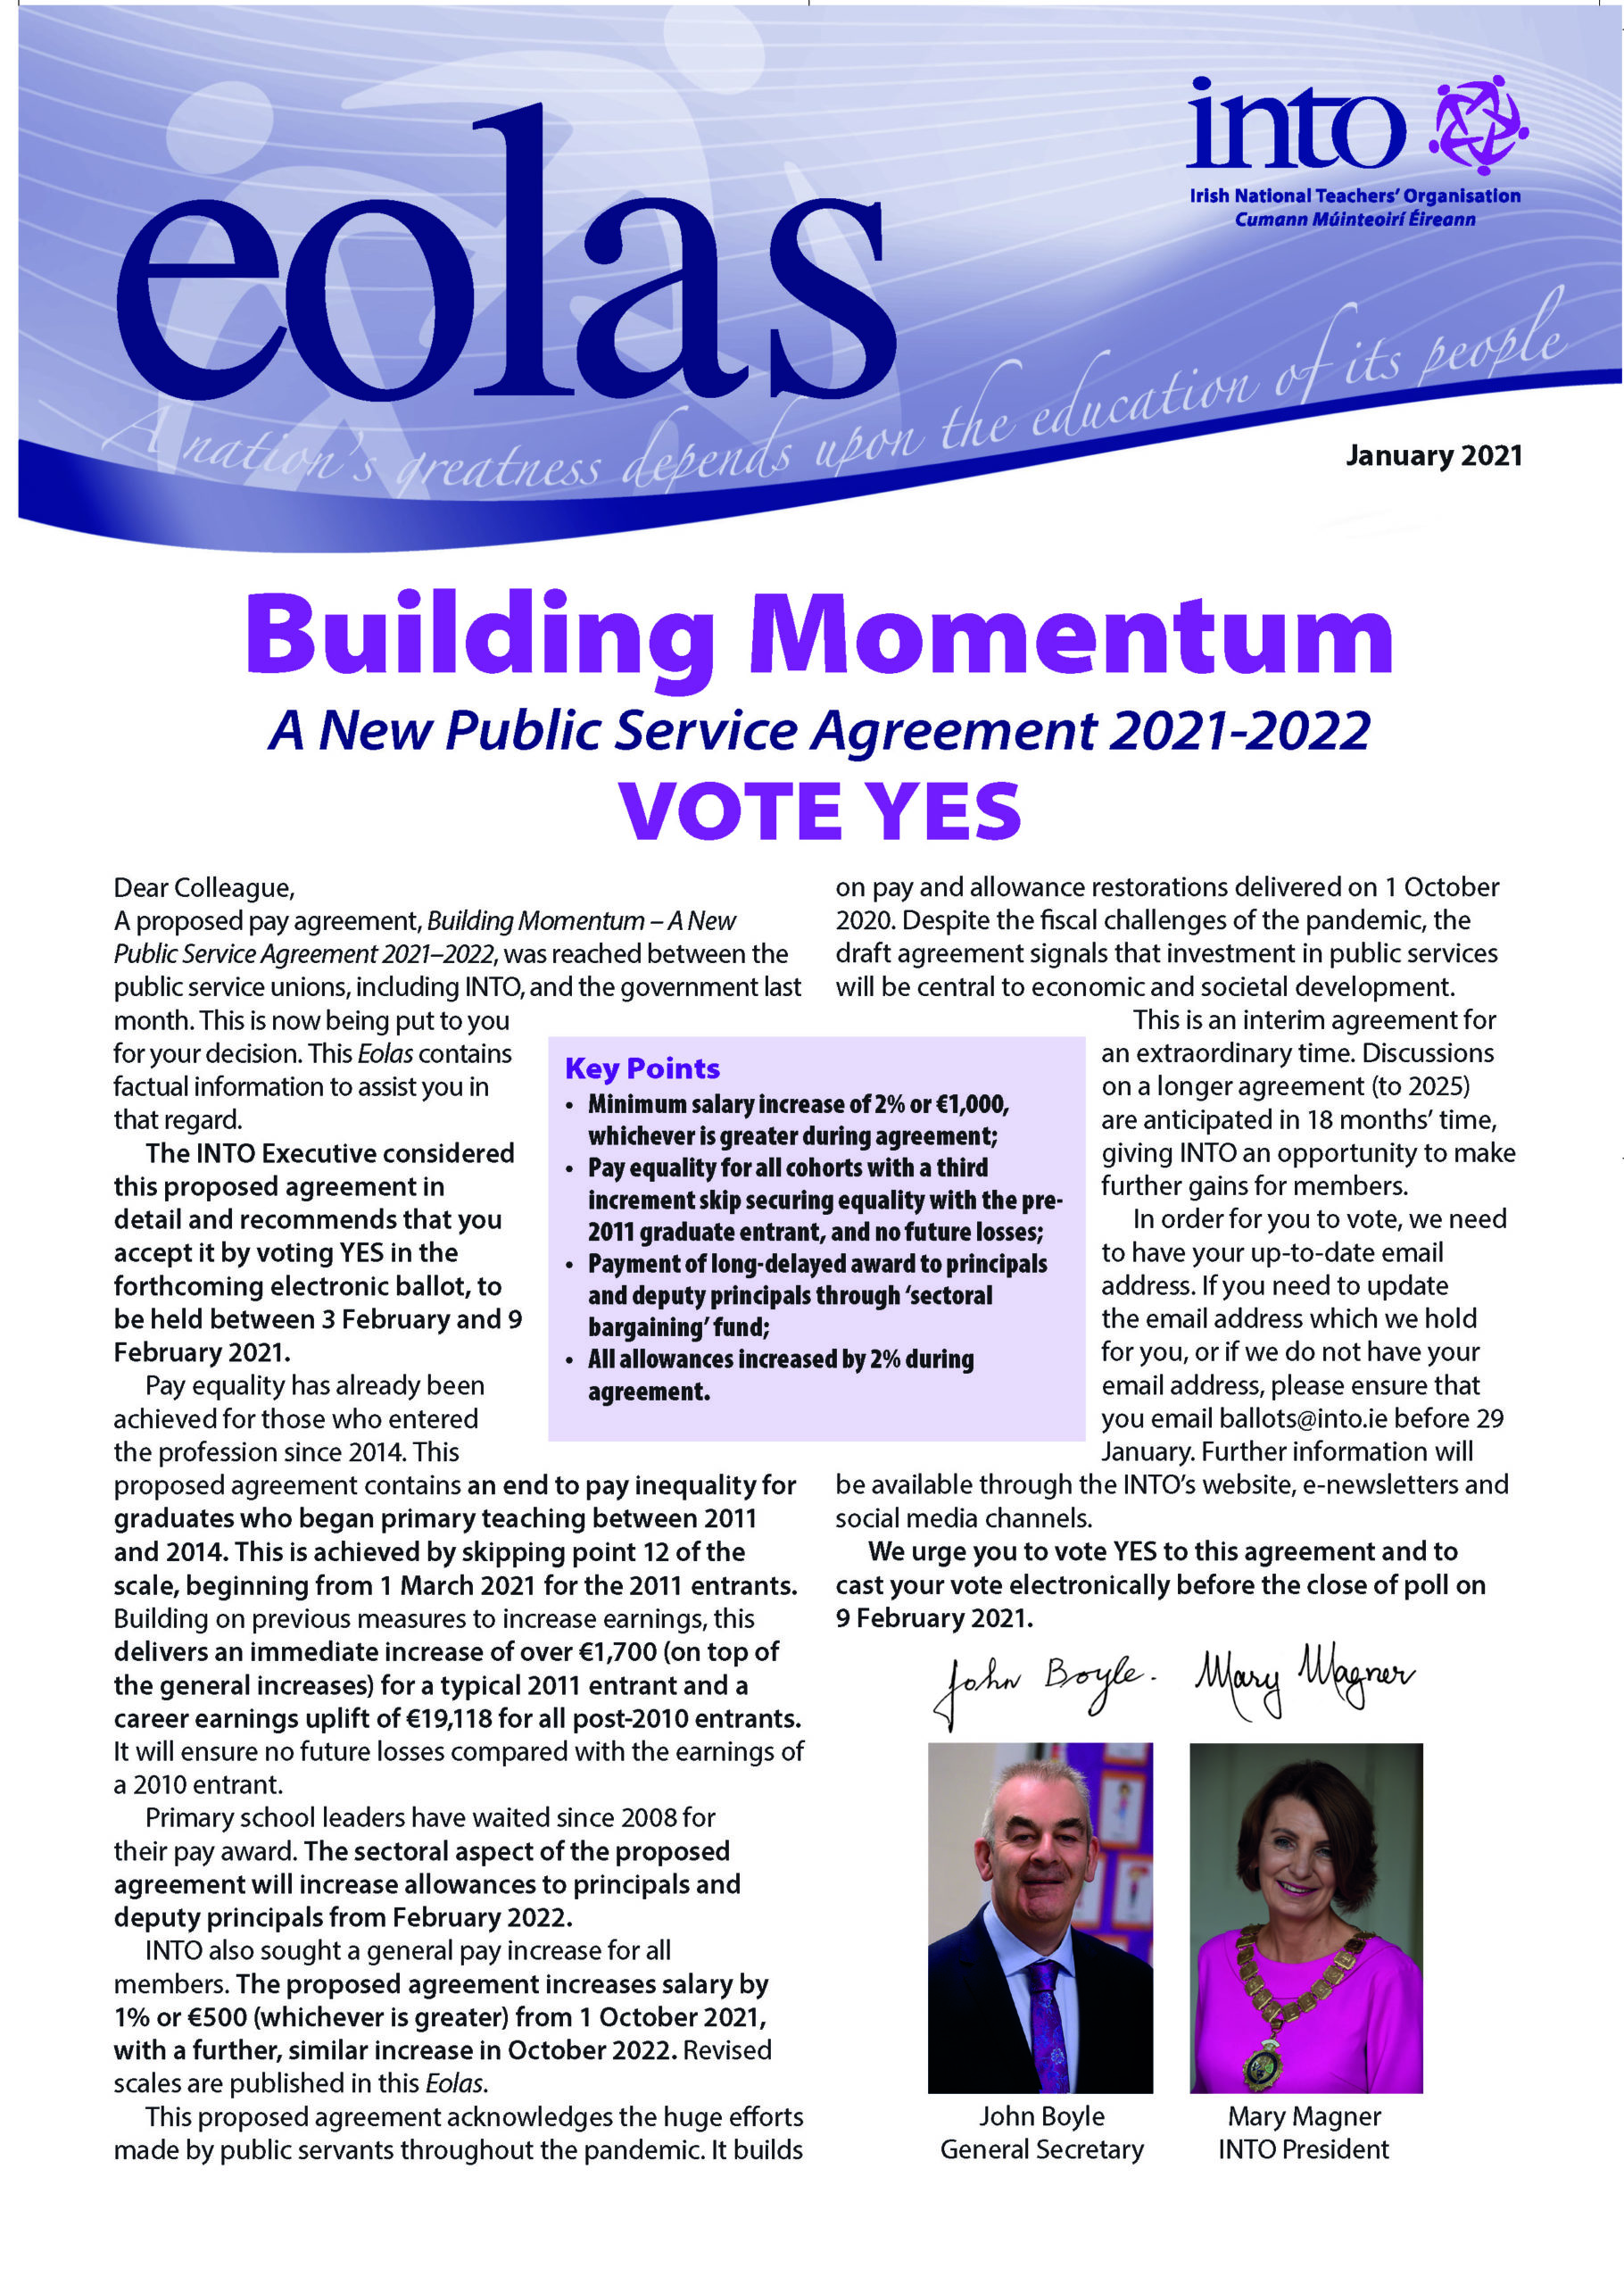 Building Momentum – A New Public Service Agreement 2021-2022